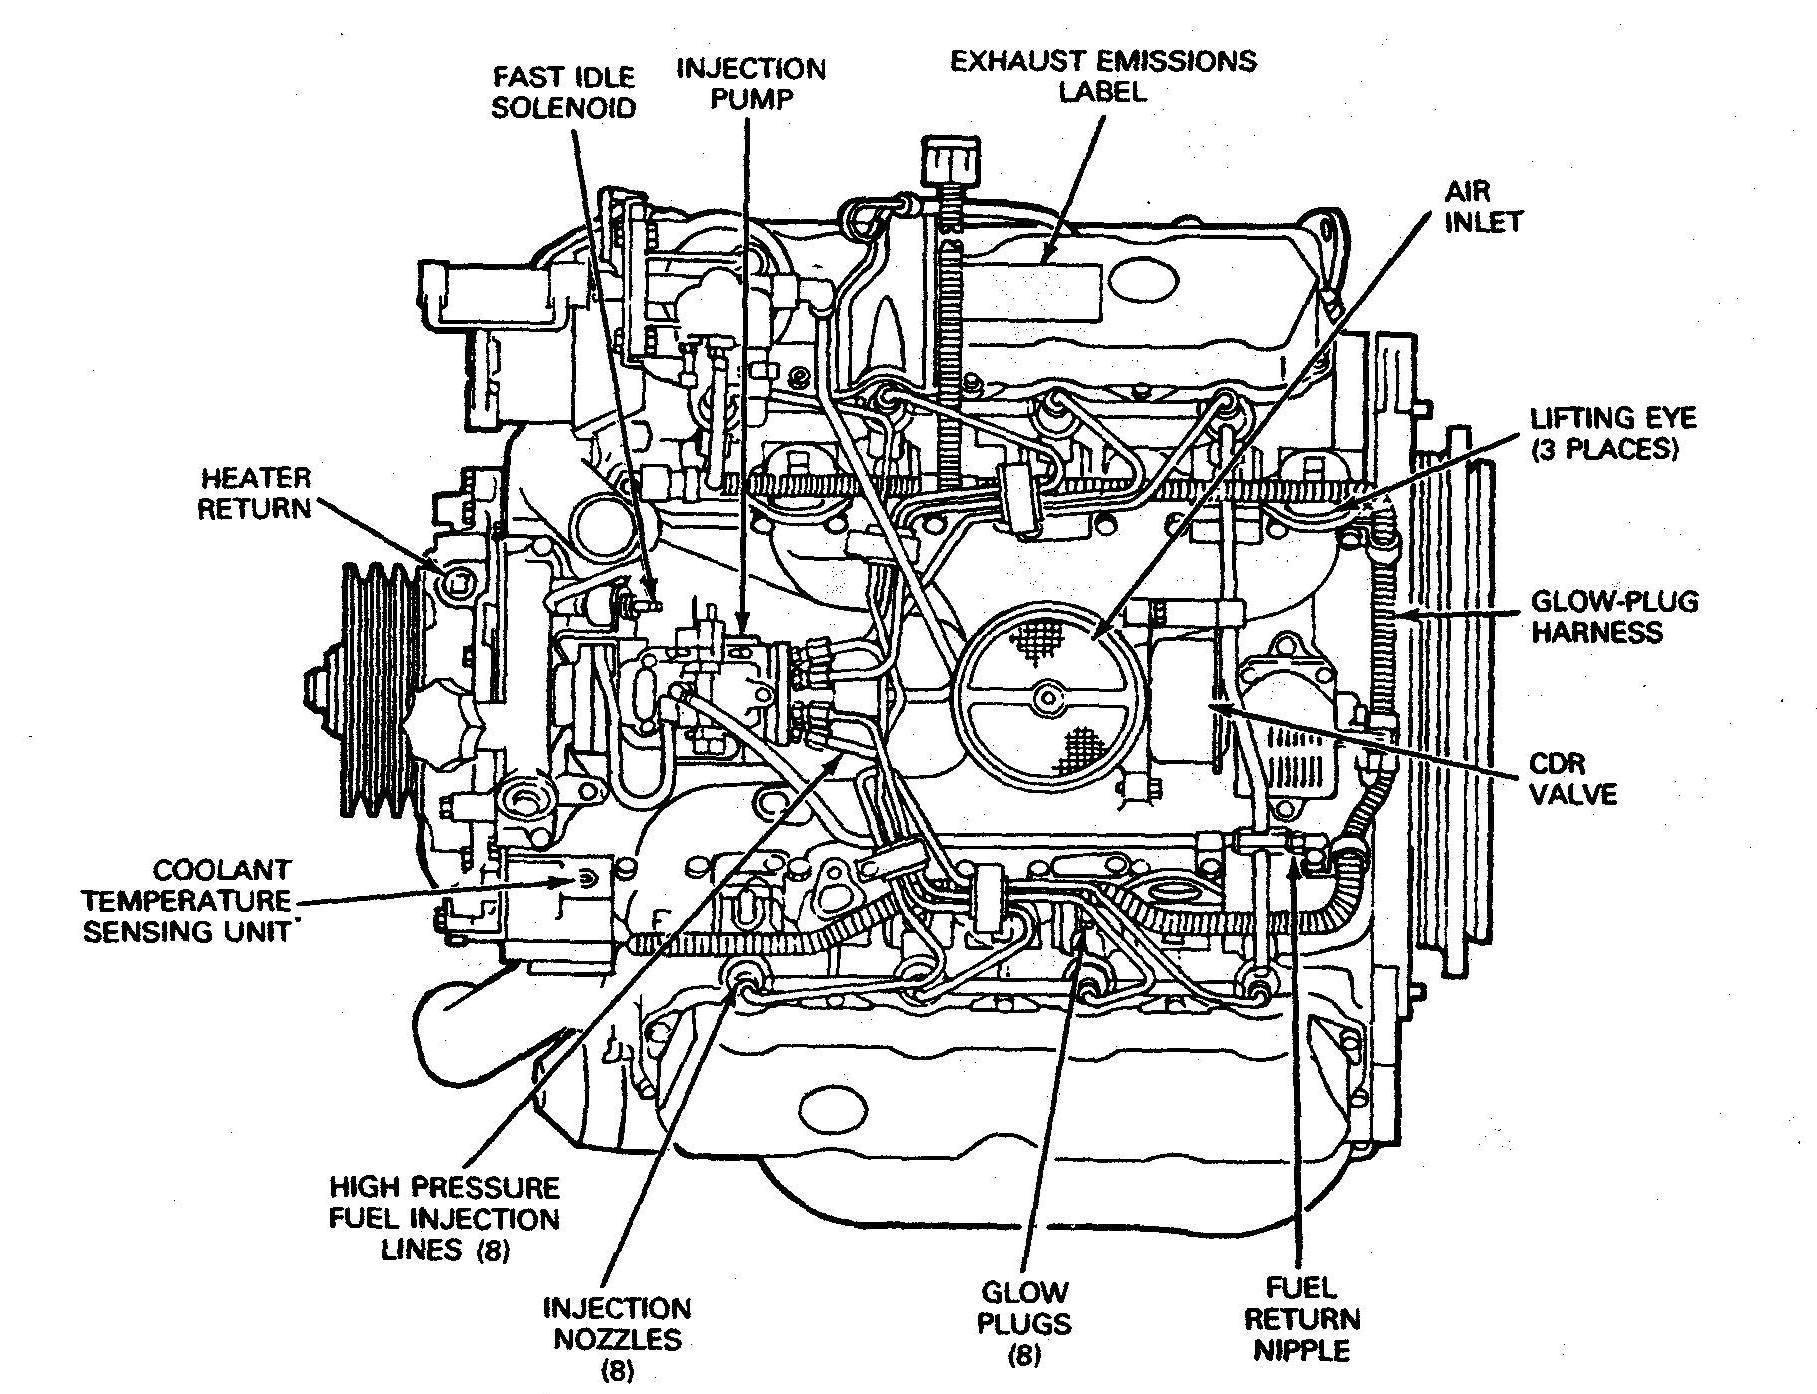 Diagram Of A Engine Automotive Engine Diagram Wiring Diagrams Of Diagram Of A Engine